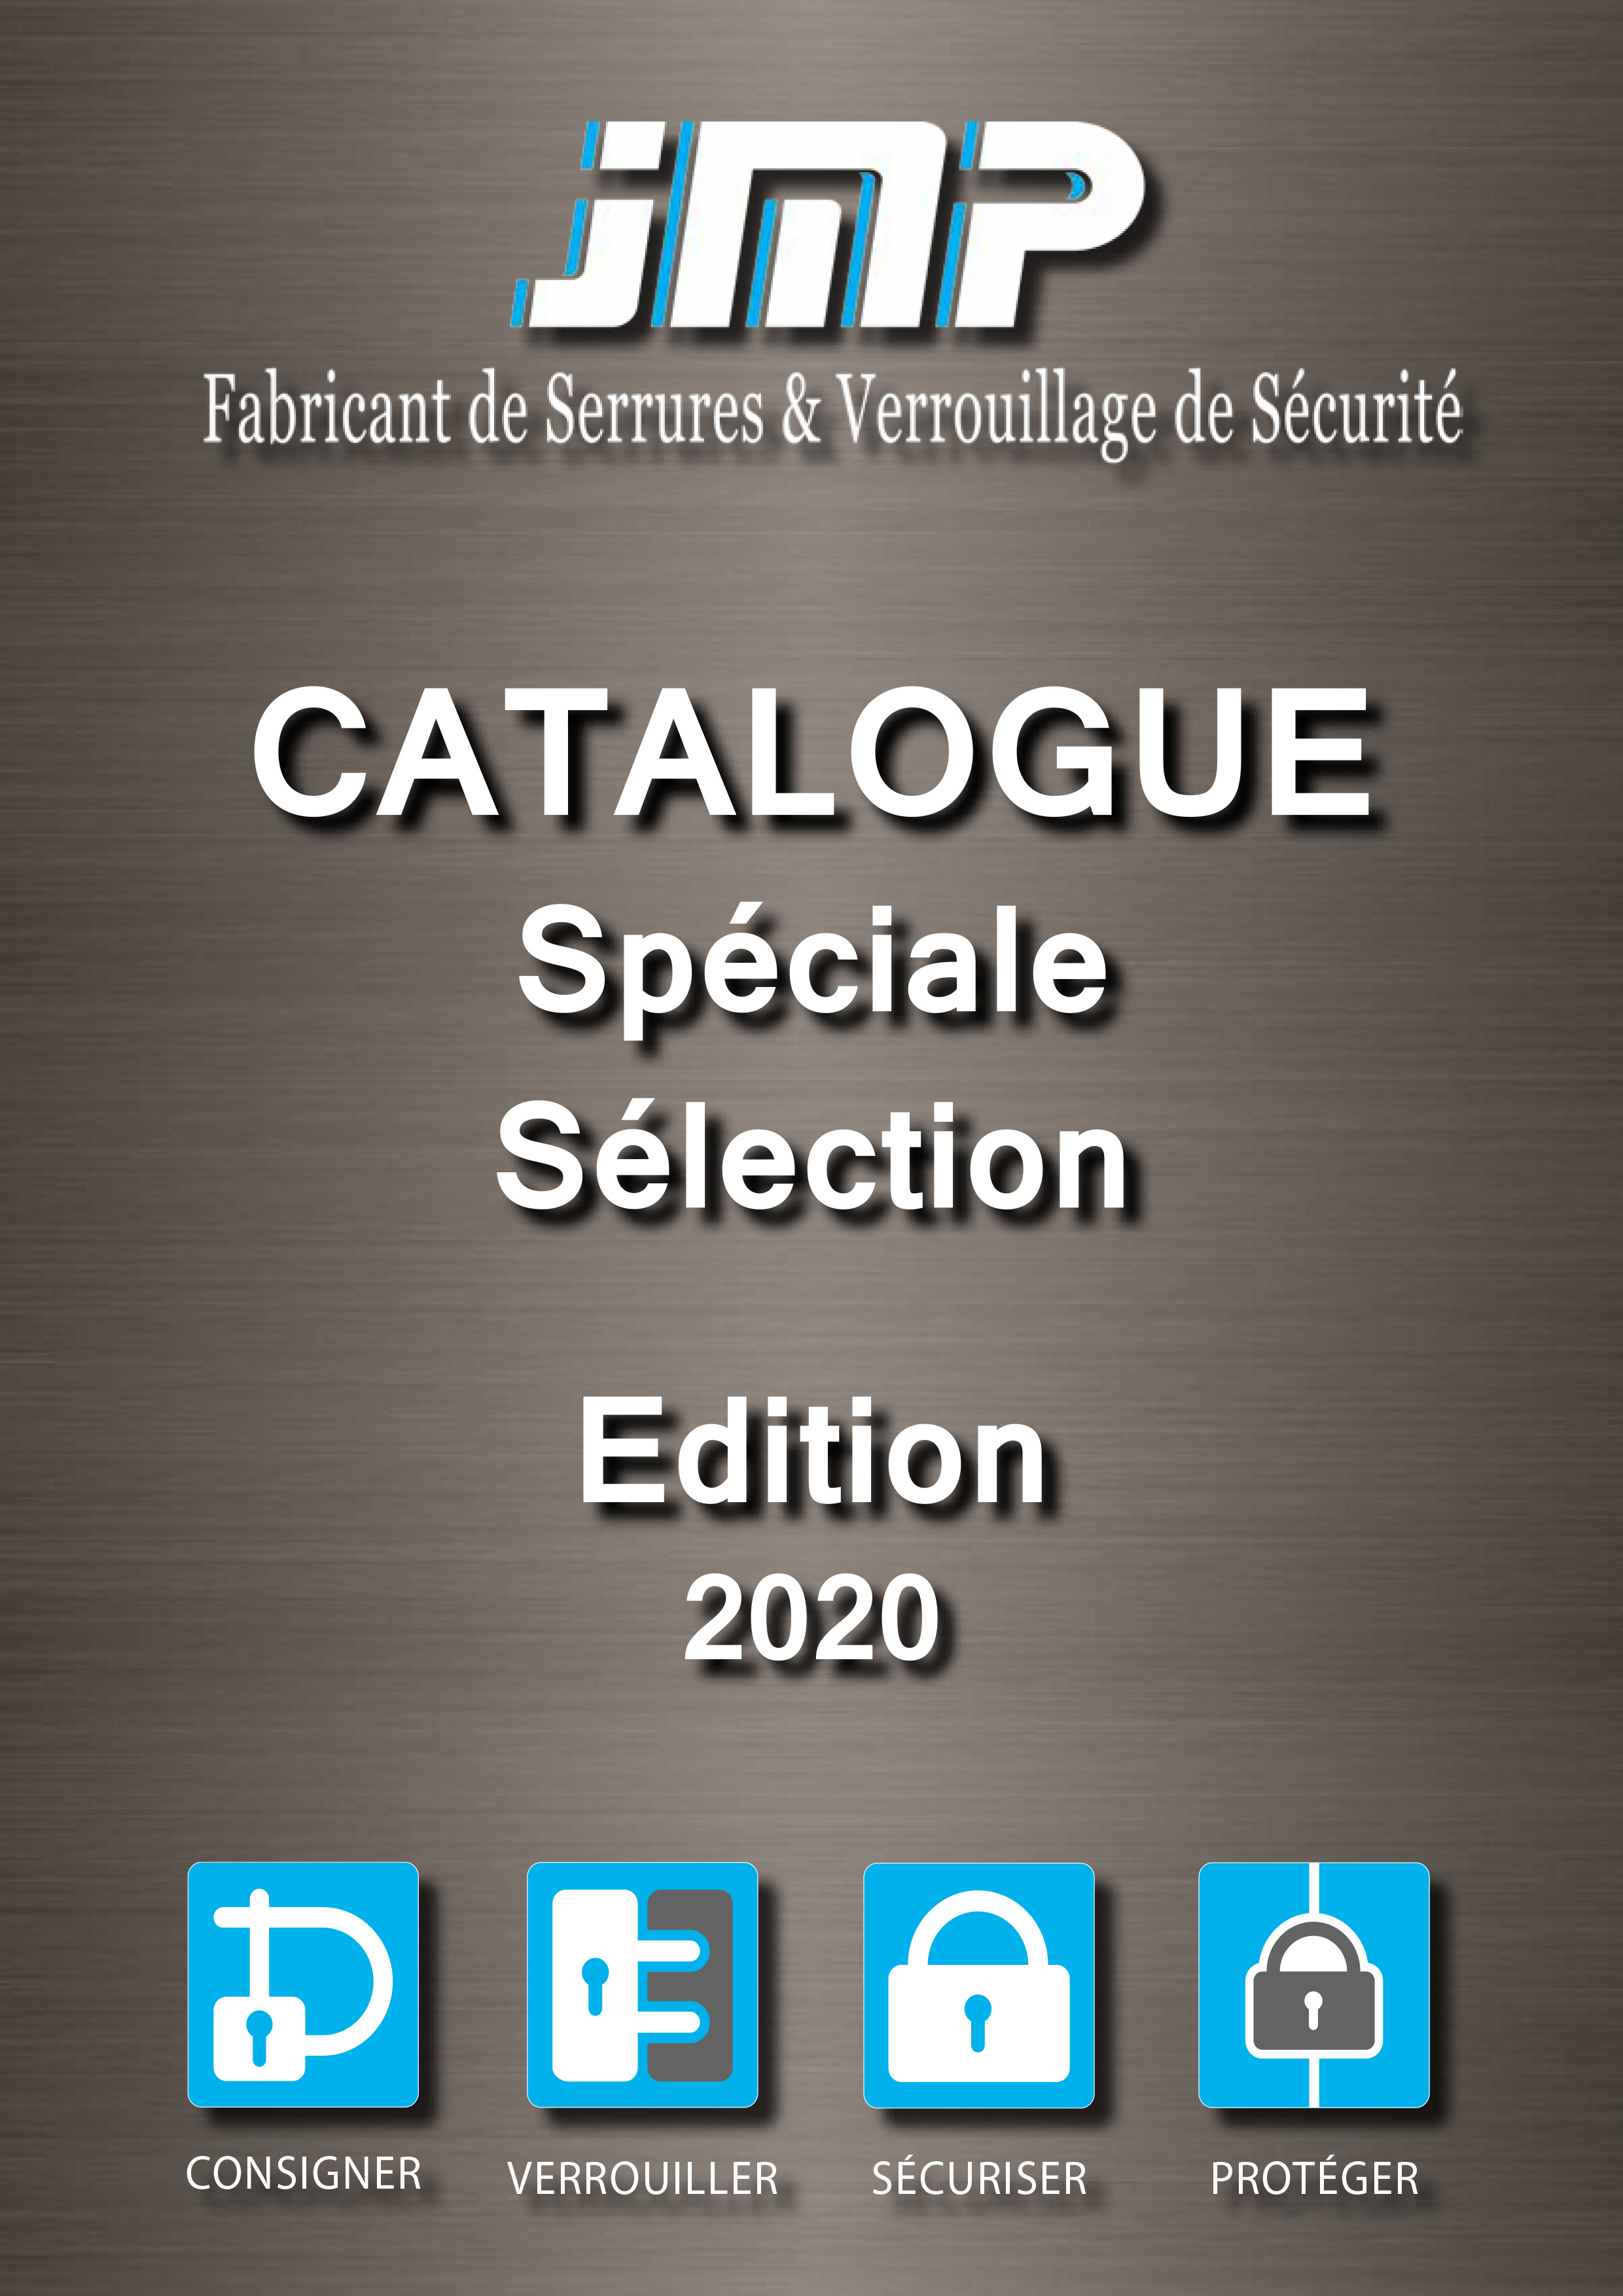 CATALOGUE SPECIALE SELECTION JMP 2020 Page de garde.jpg